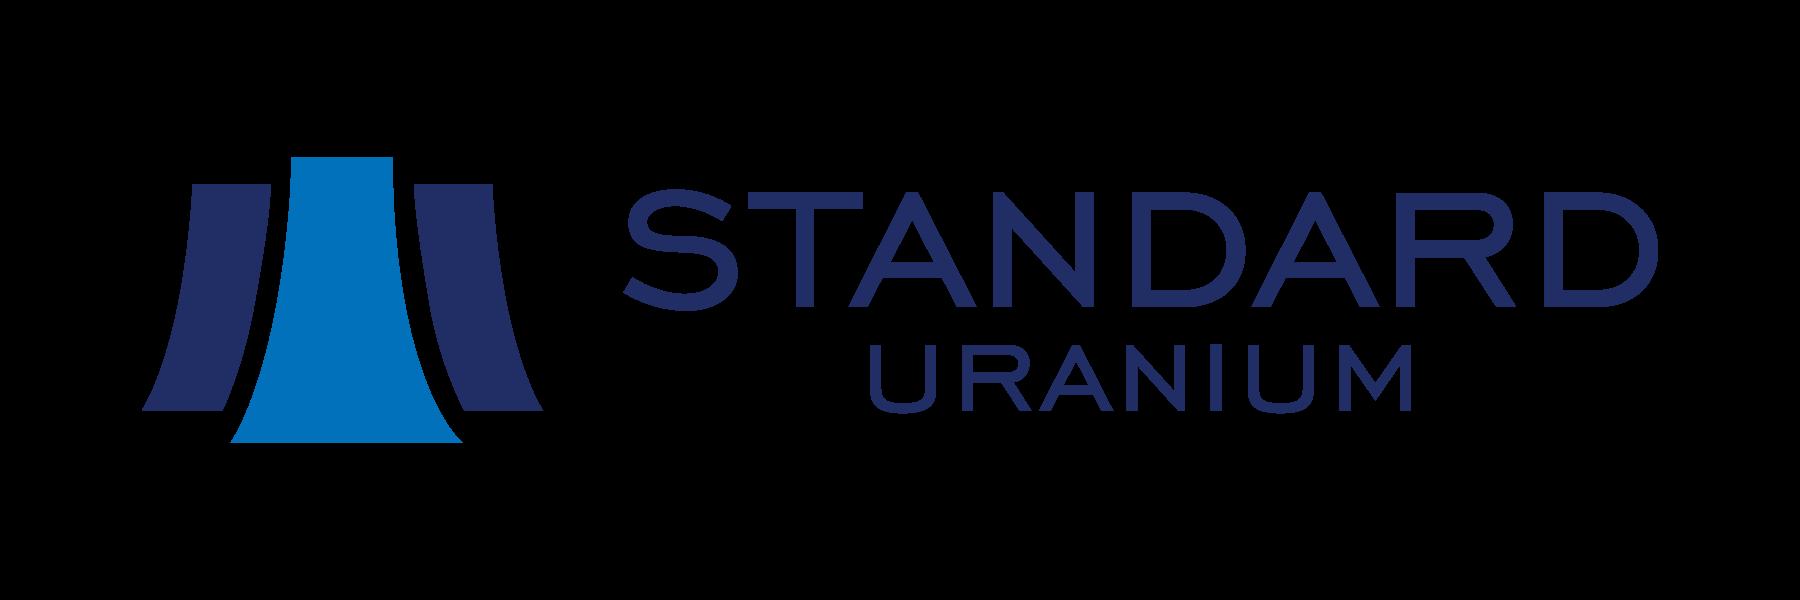 Standard Uranium Samples Off-Scale Uranium Mineralization at Surface, Gunnar Uranium Project